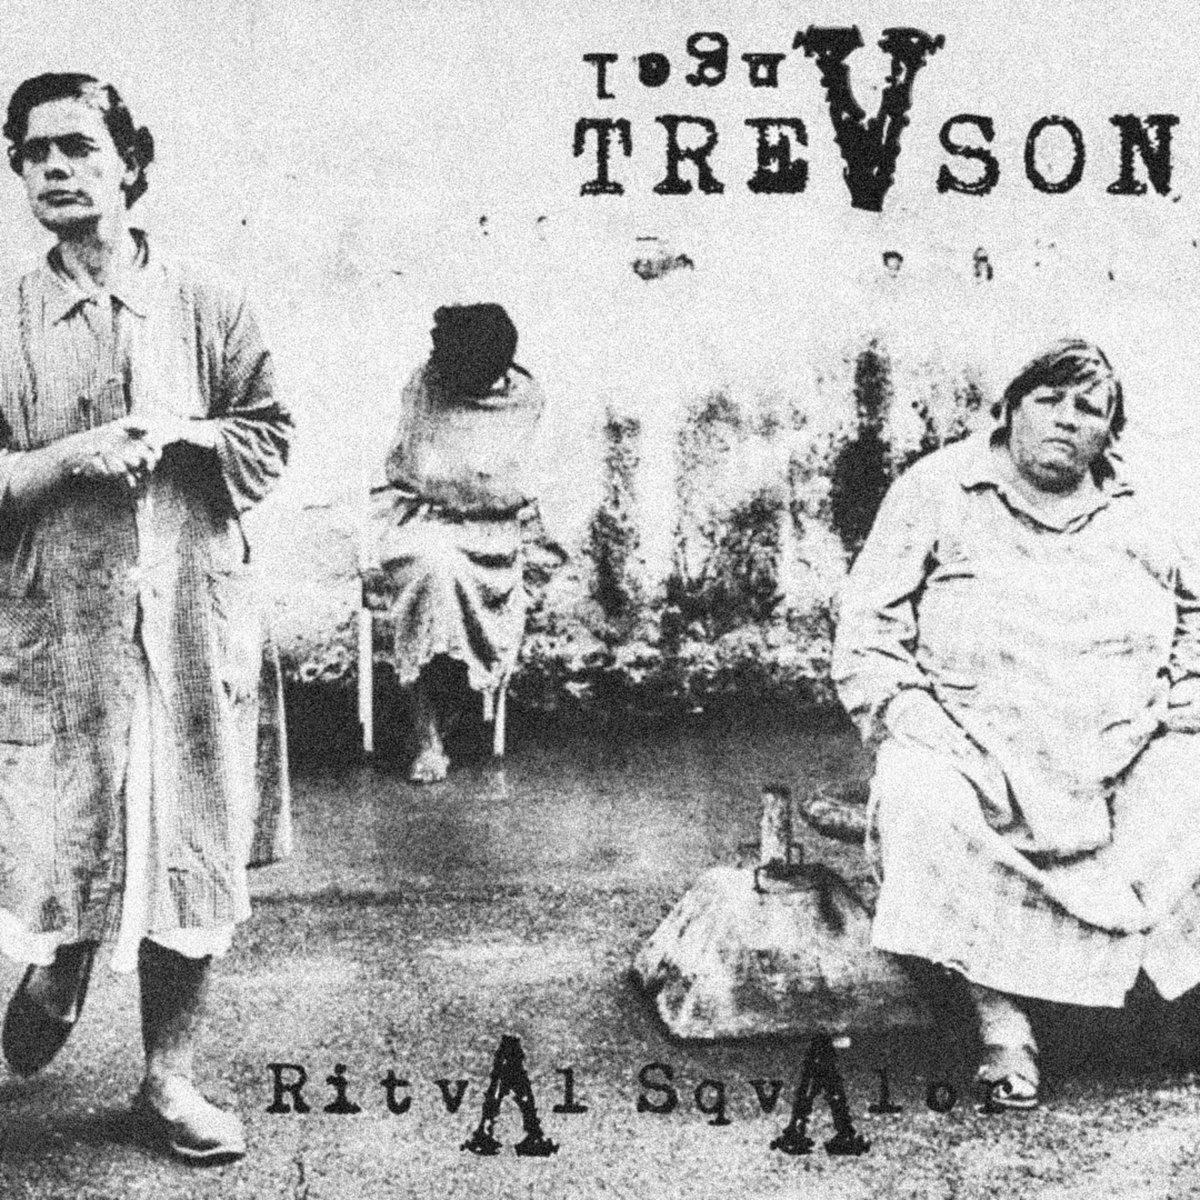 Treason Angel | Ritual Squalor | Self-Released